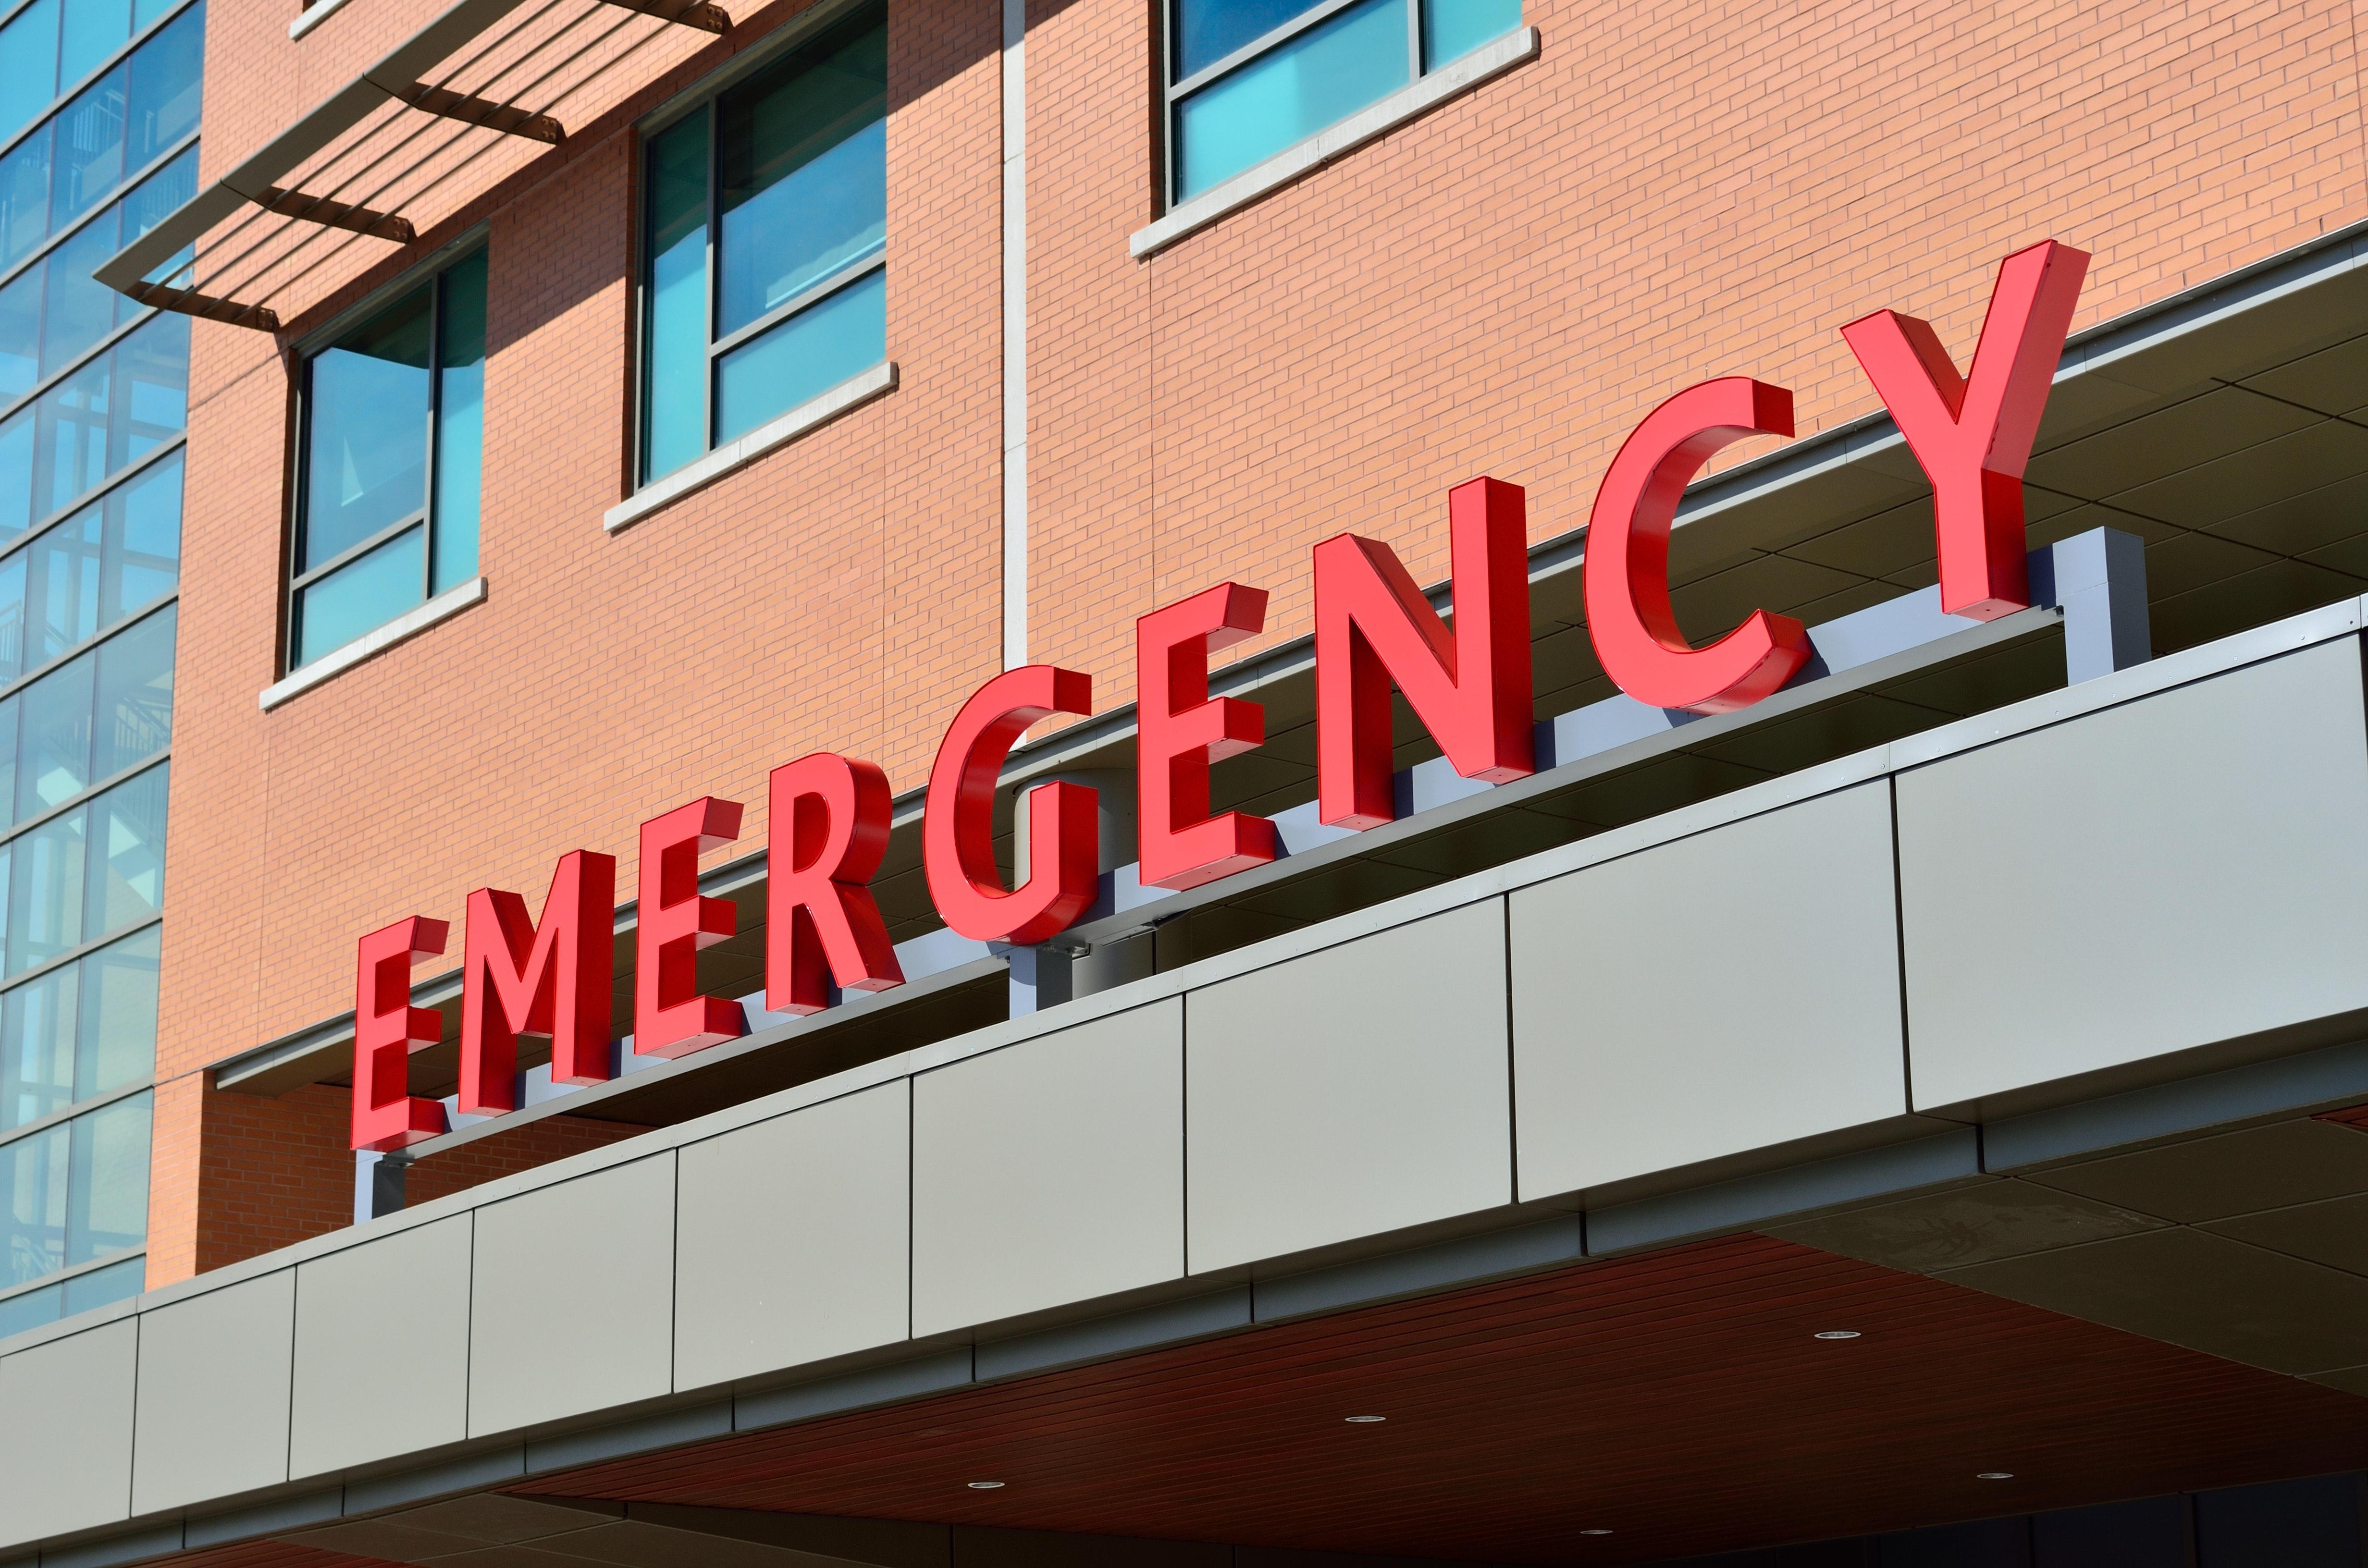 emergency area of hospital